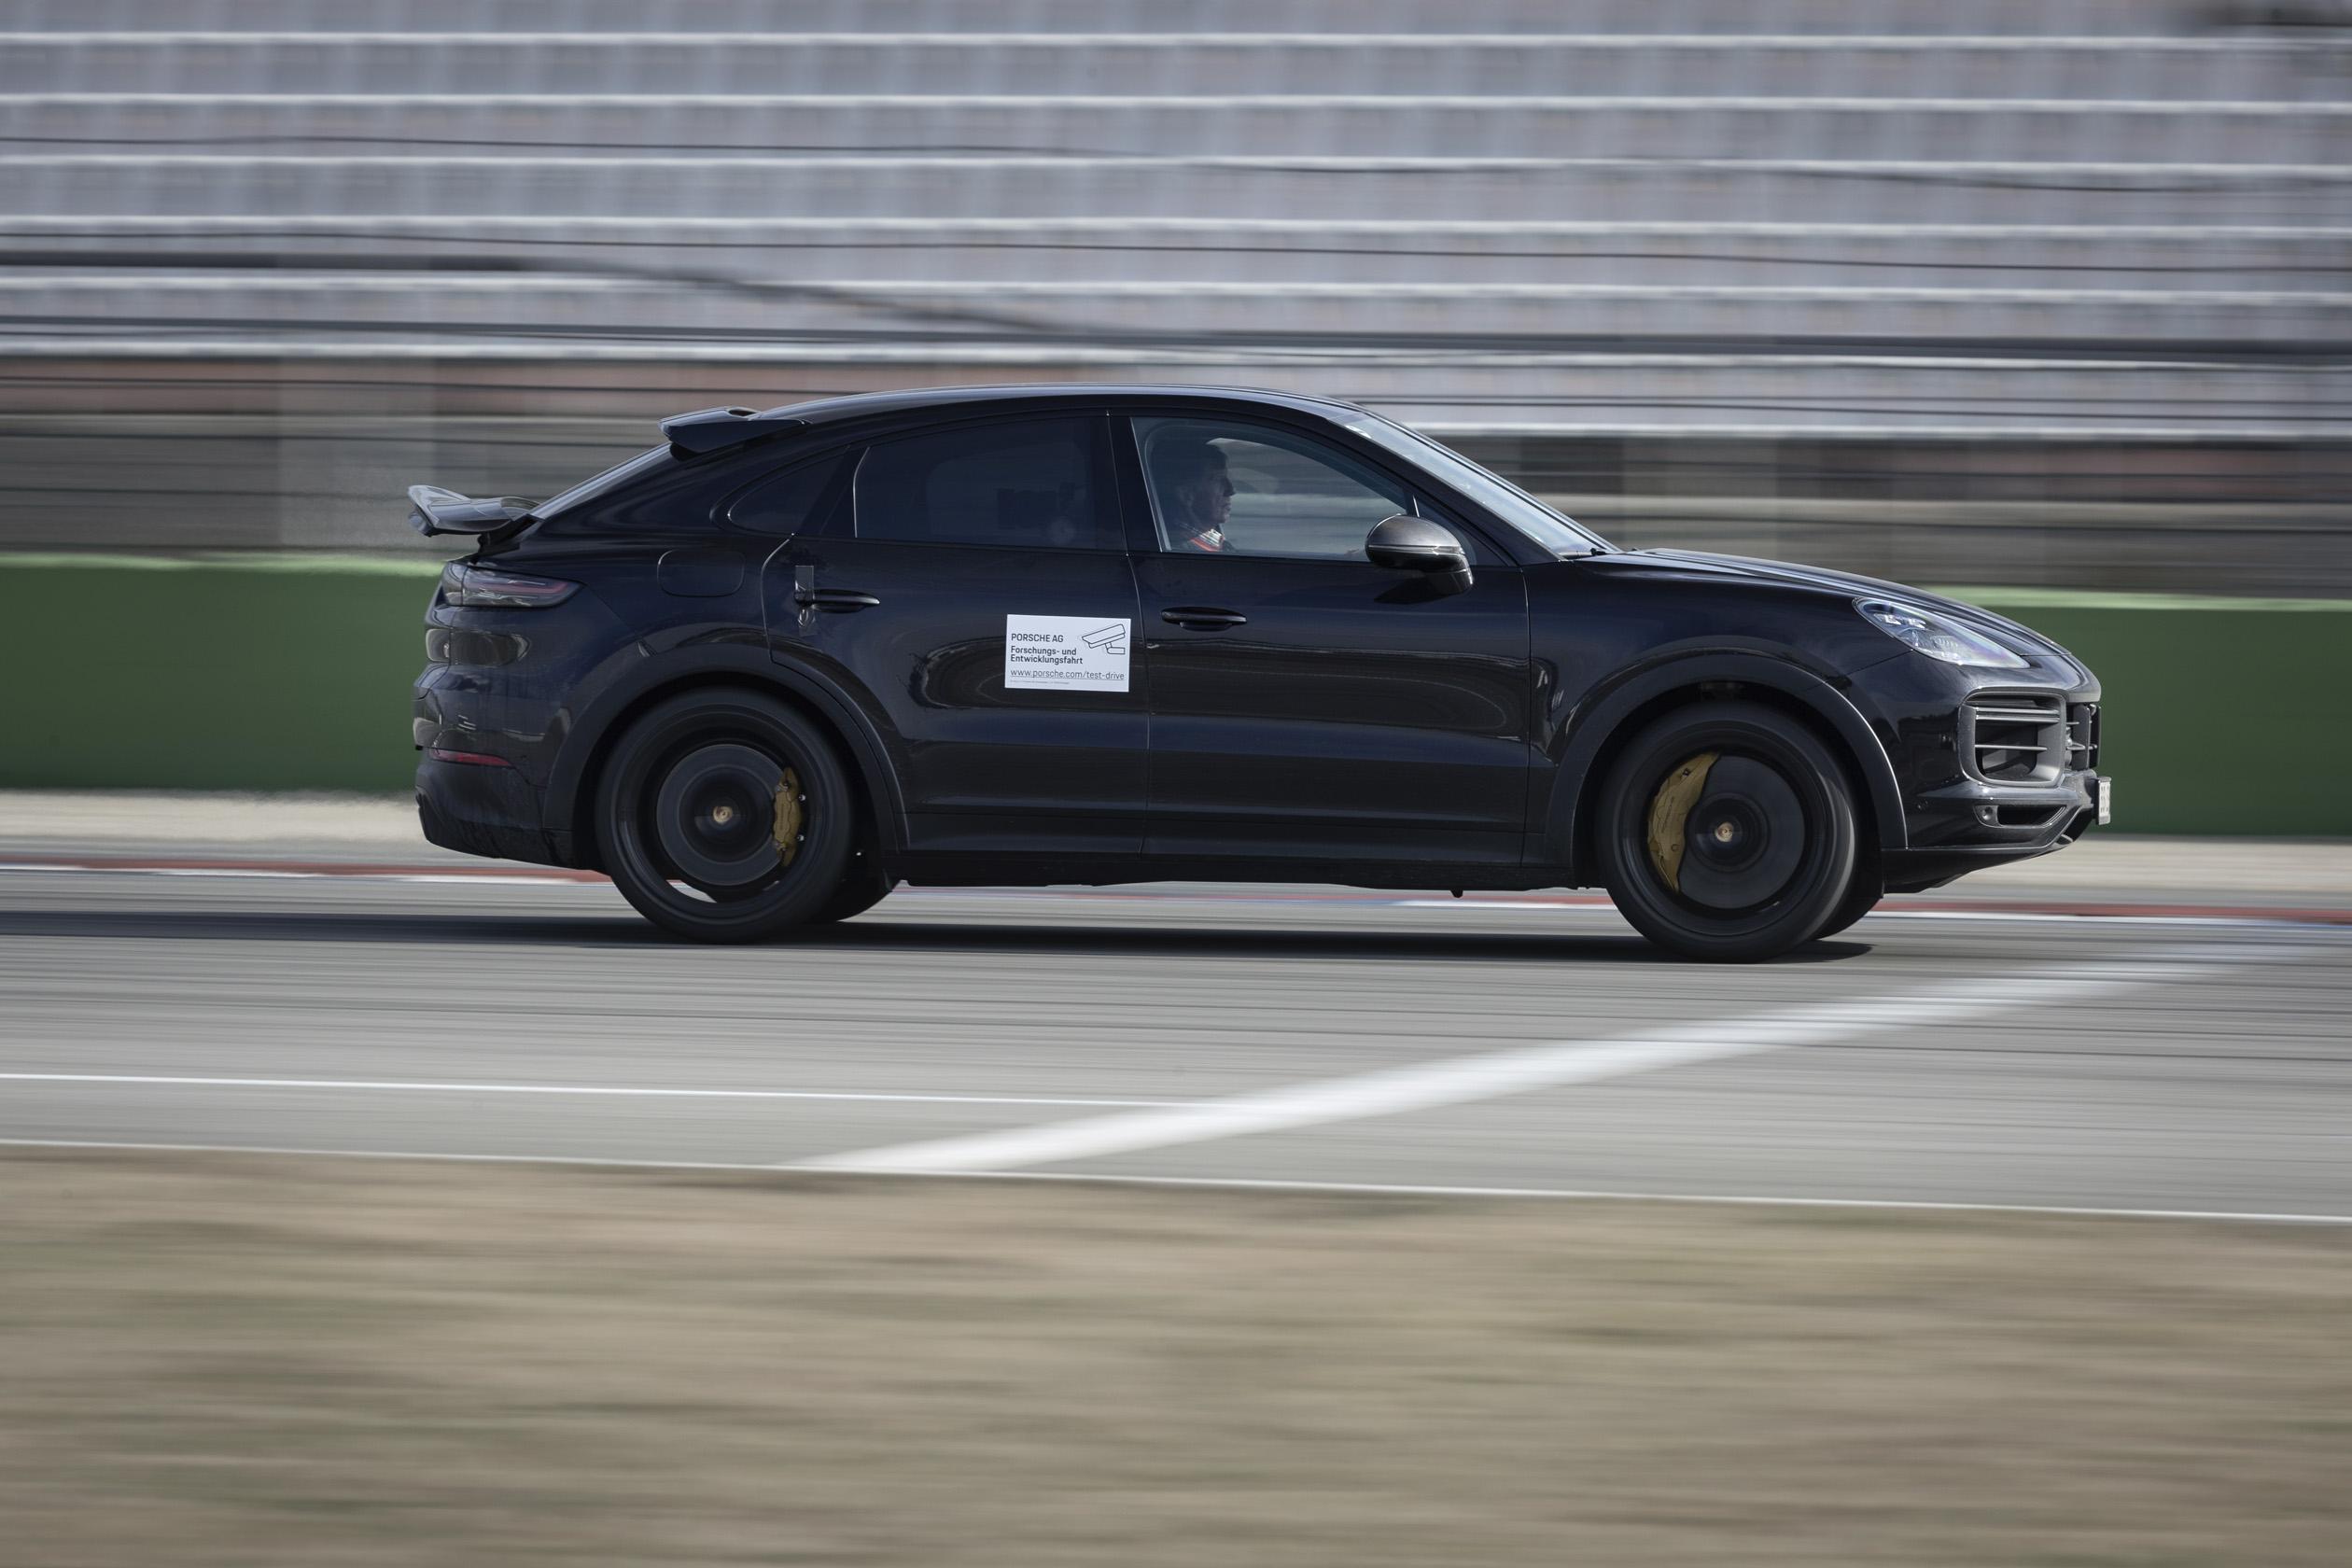 Porsche's developing a new, Lamborghini Urus beating Cayenne Super-SUV?